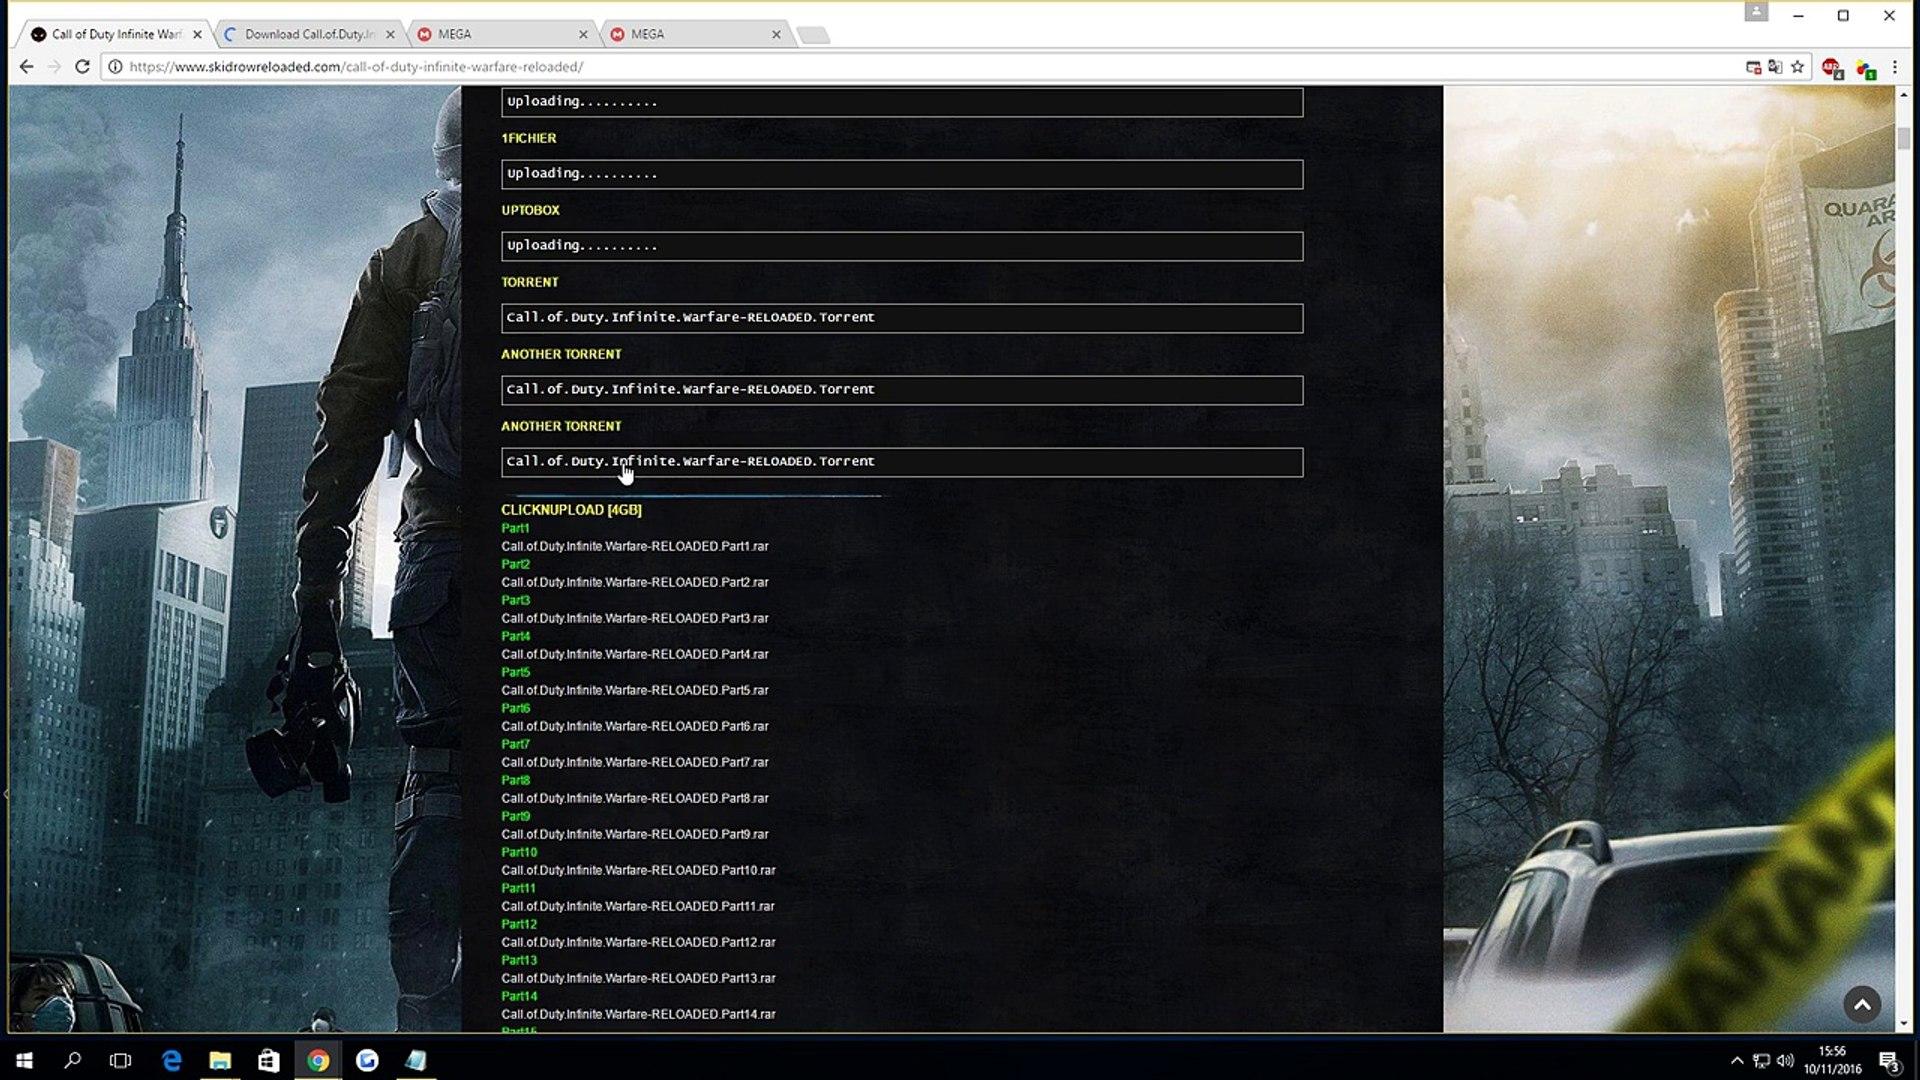 download call of duty infinite warfare torrent